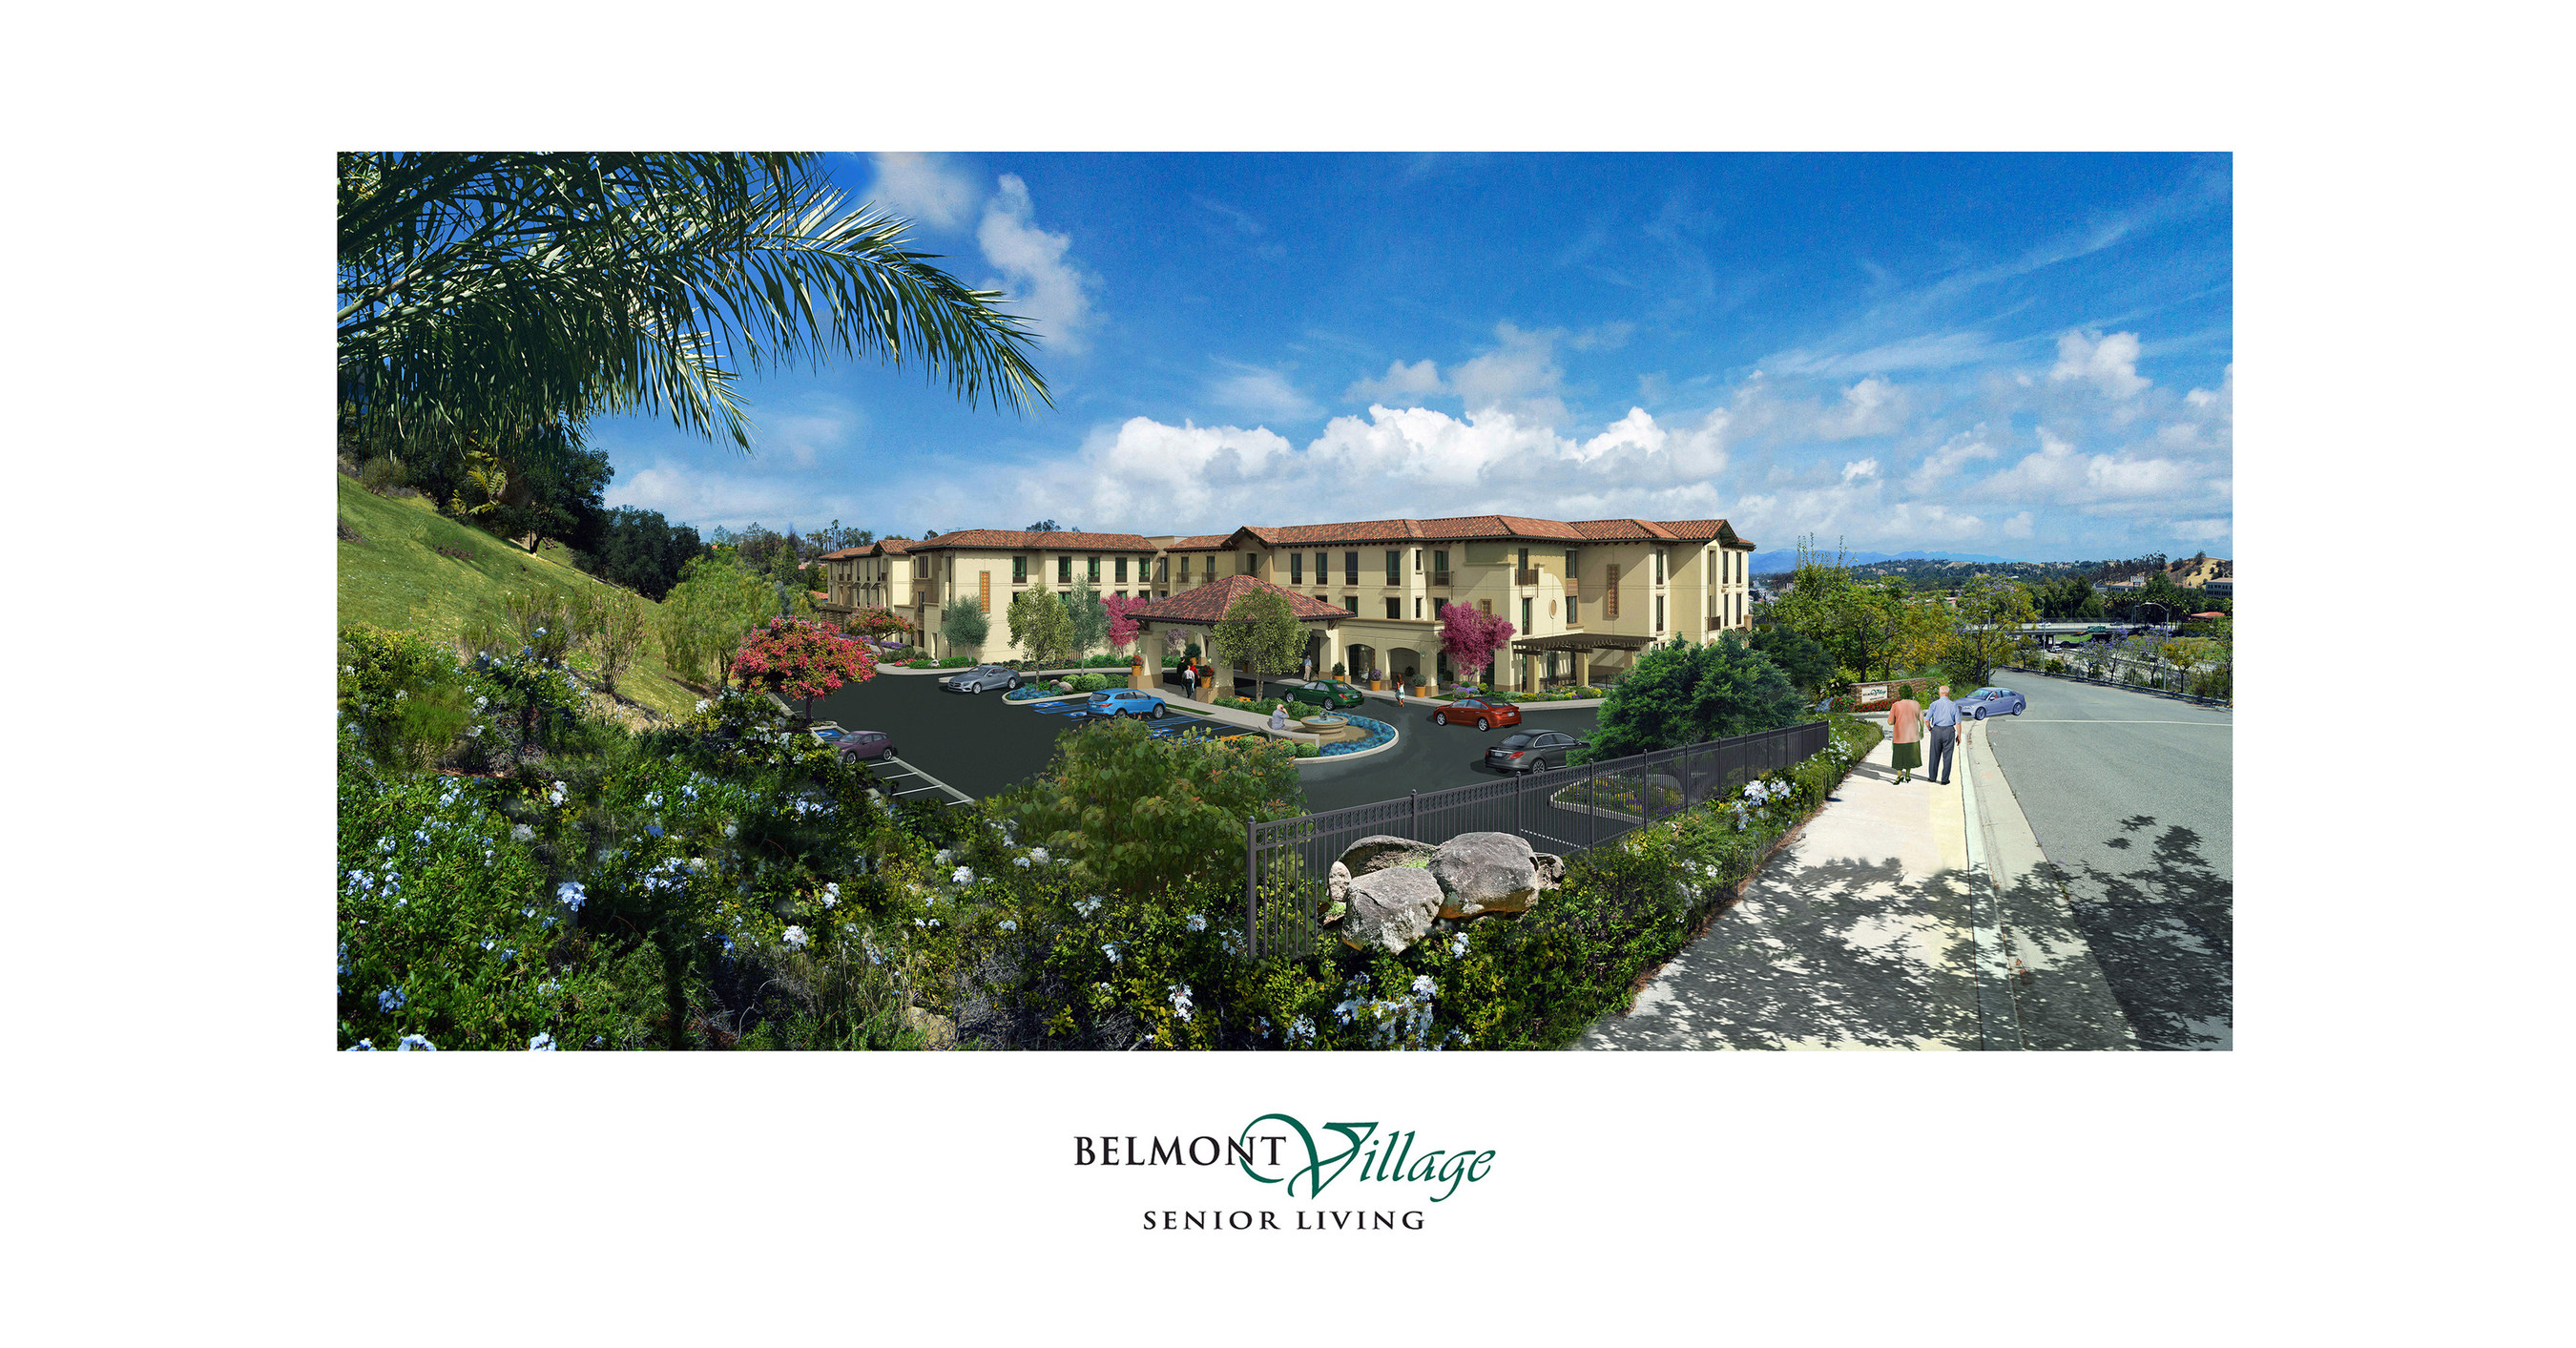 Belmont Village Calabasas Achieves Major Construction